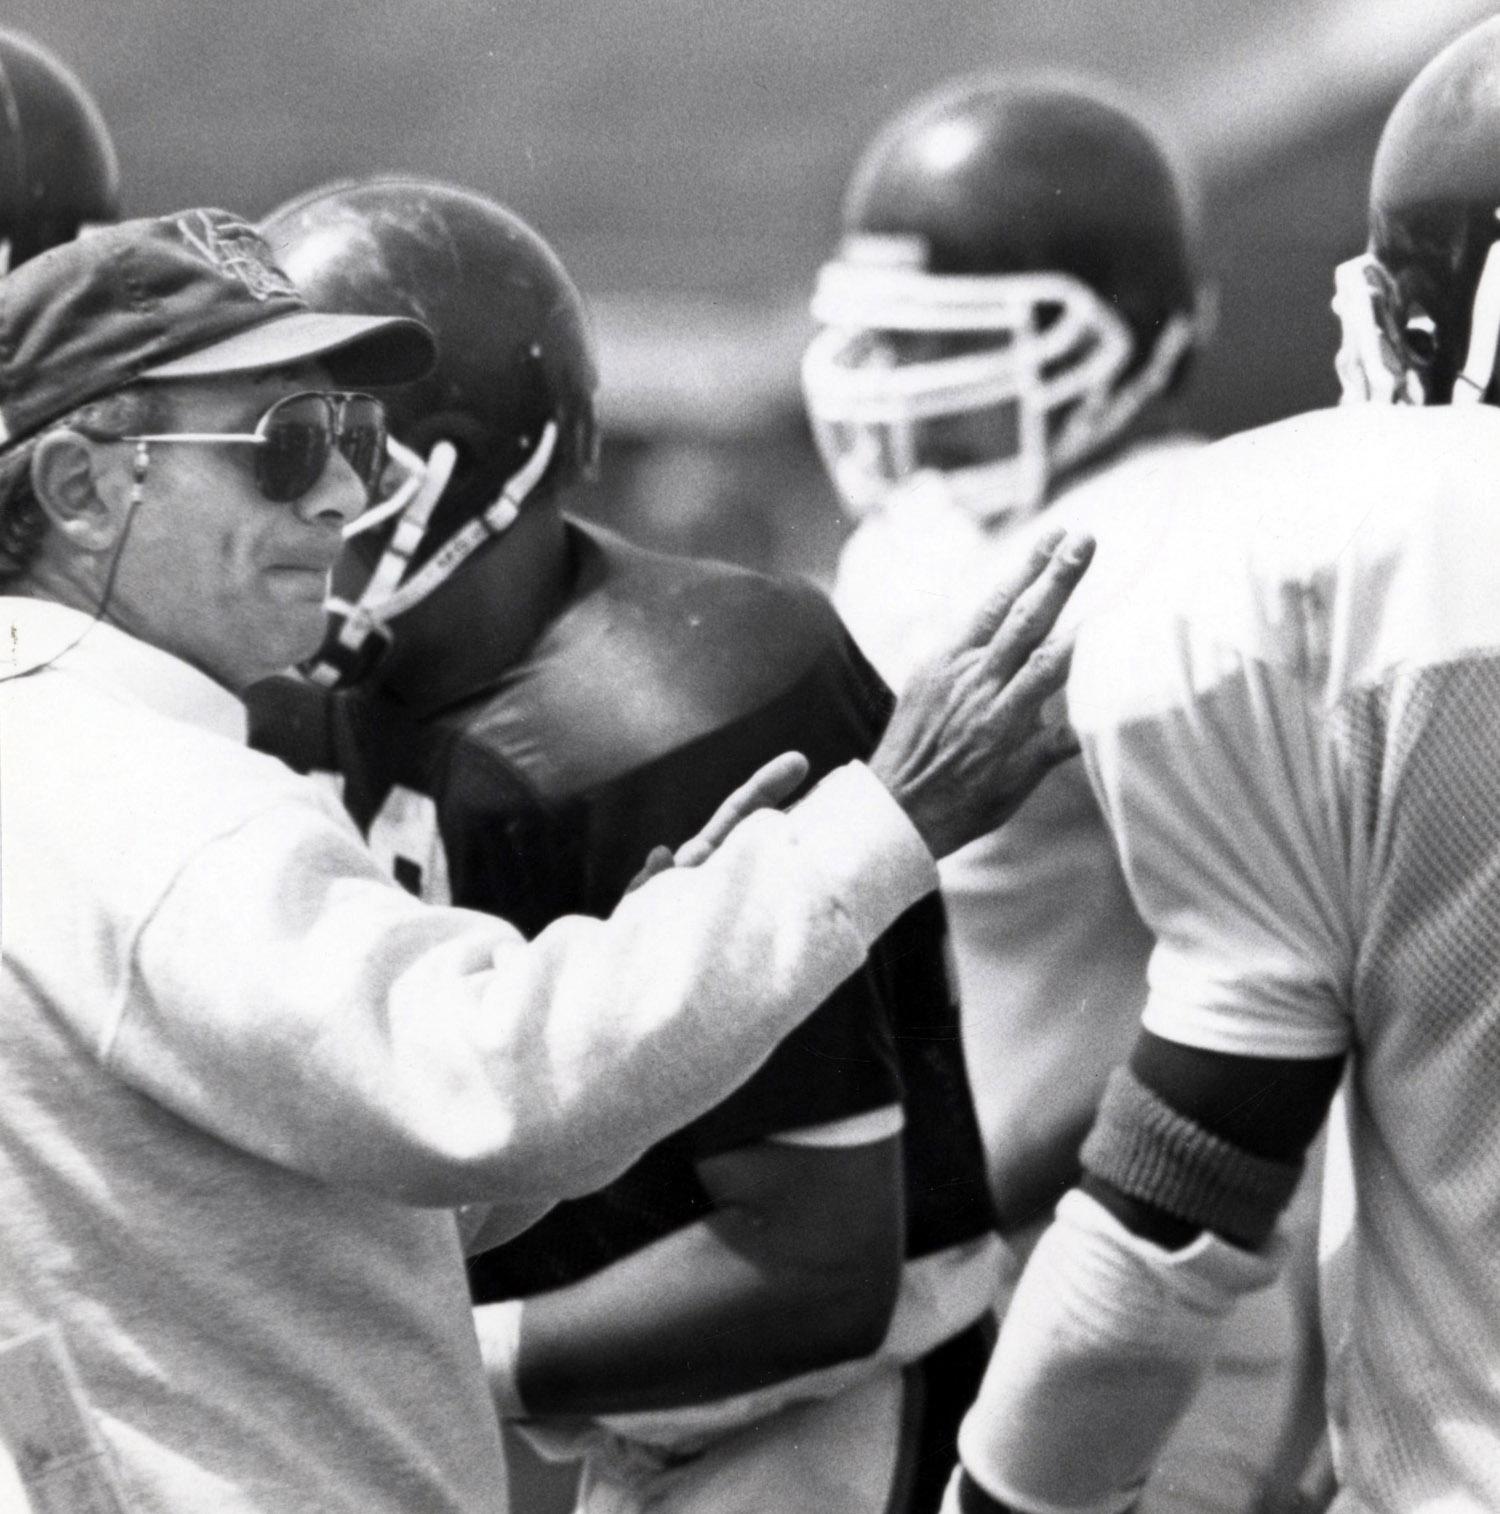 Phil Elmassian, photo courtesy of Virginia Tech sports photography.